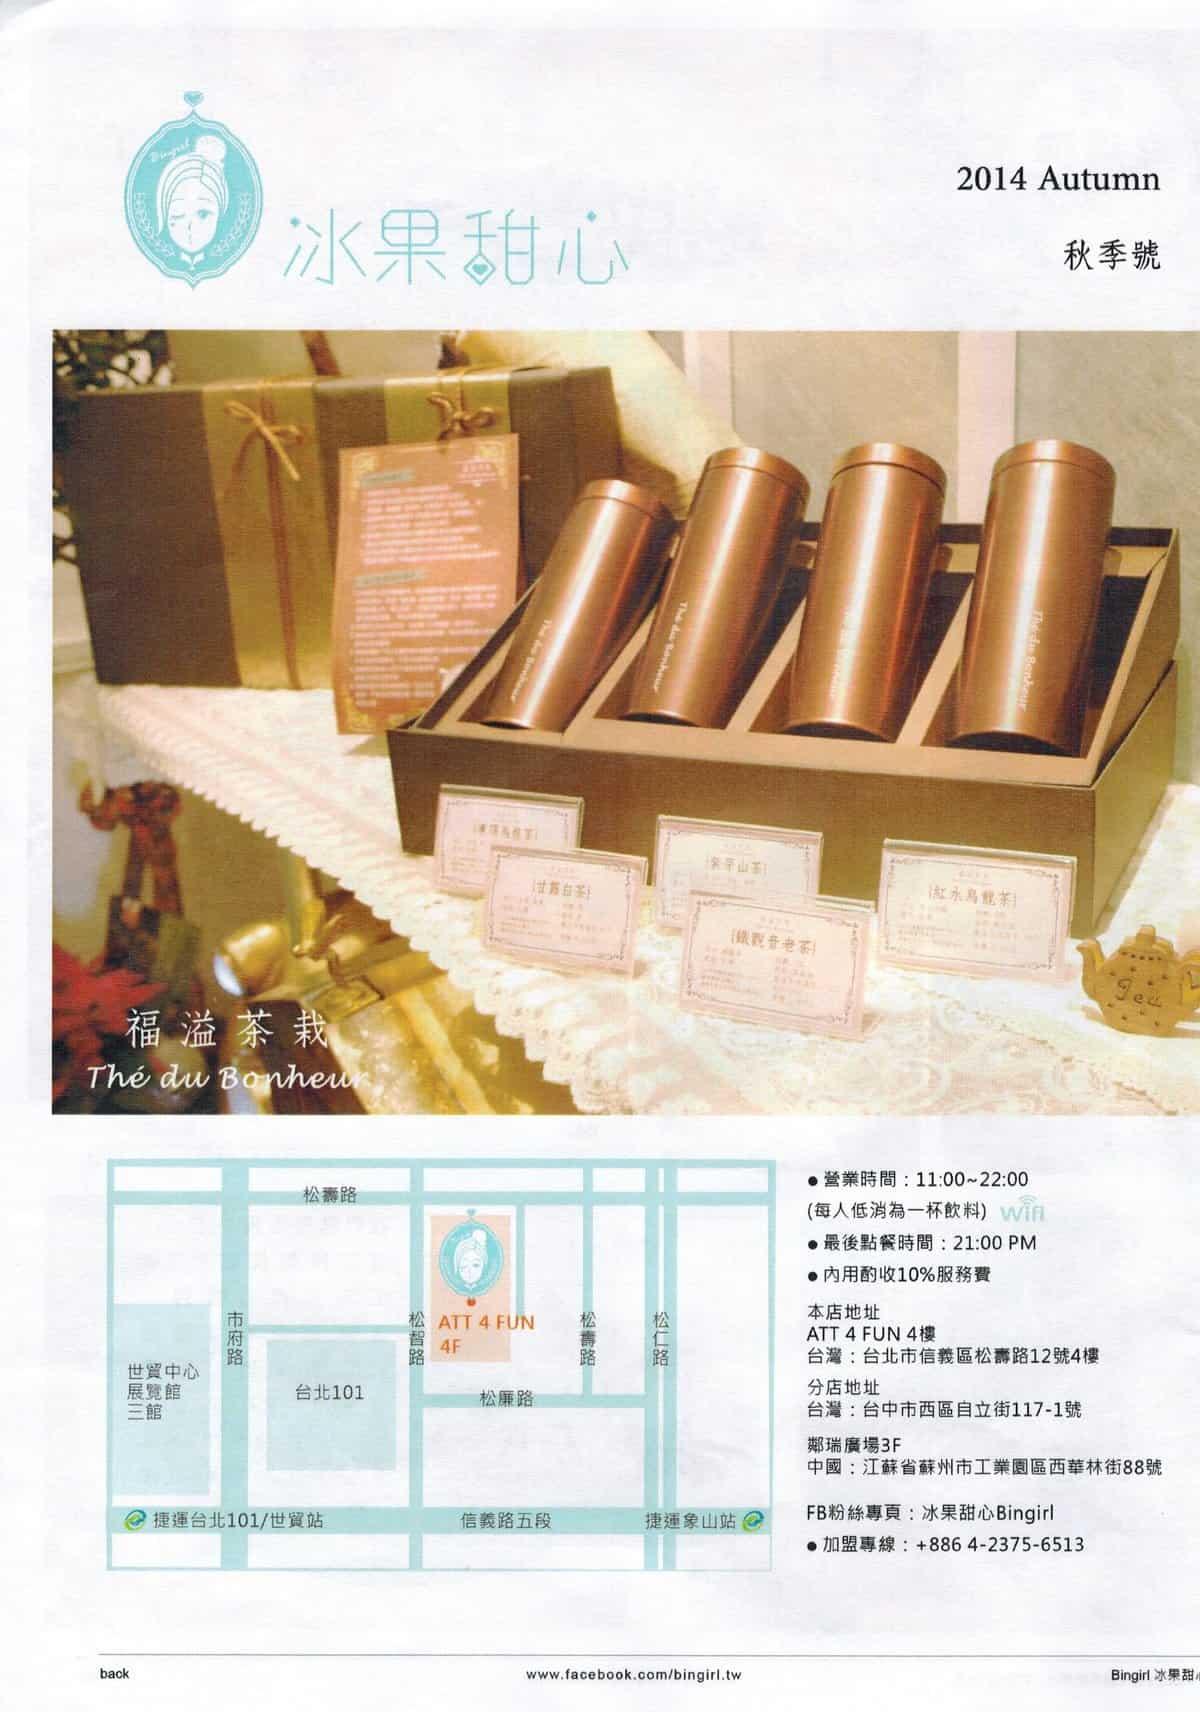 taipei-bingirl-menu12